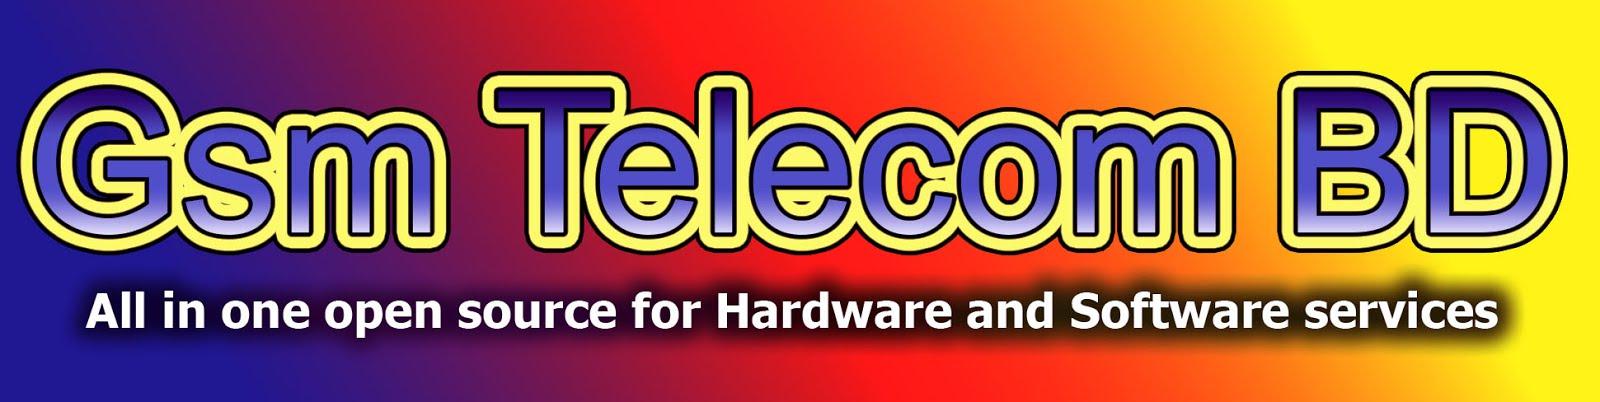 Samsung SM-J500H Cert Efs Qcn File Free Download By